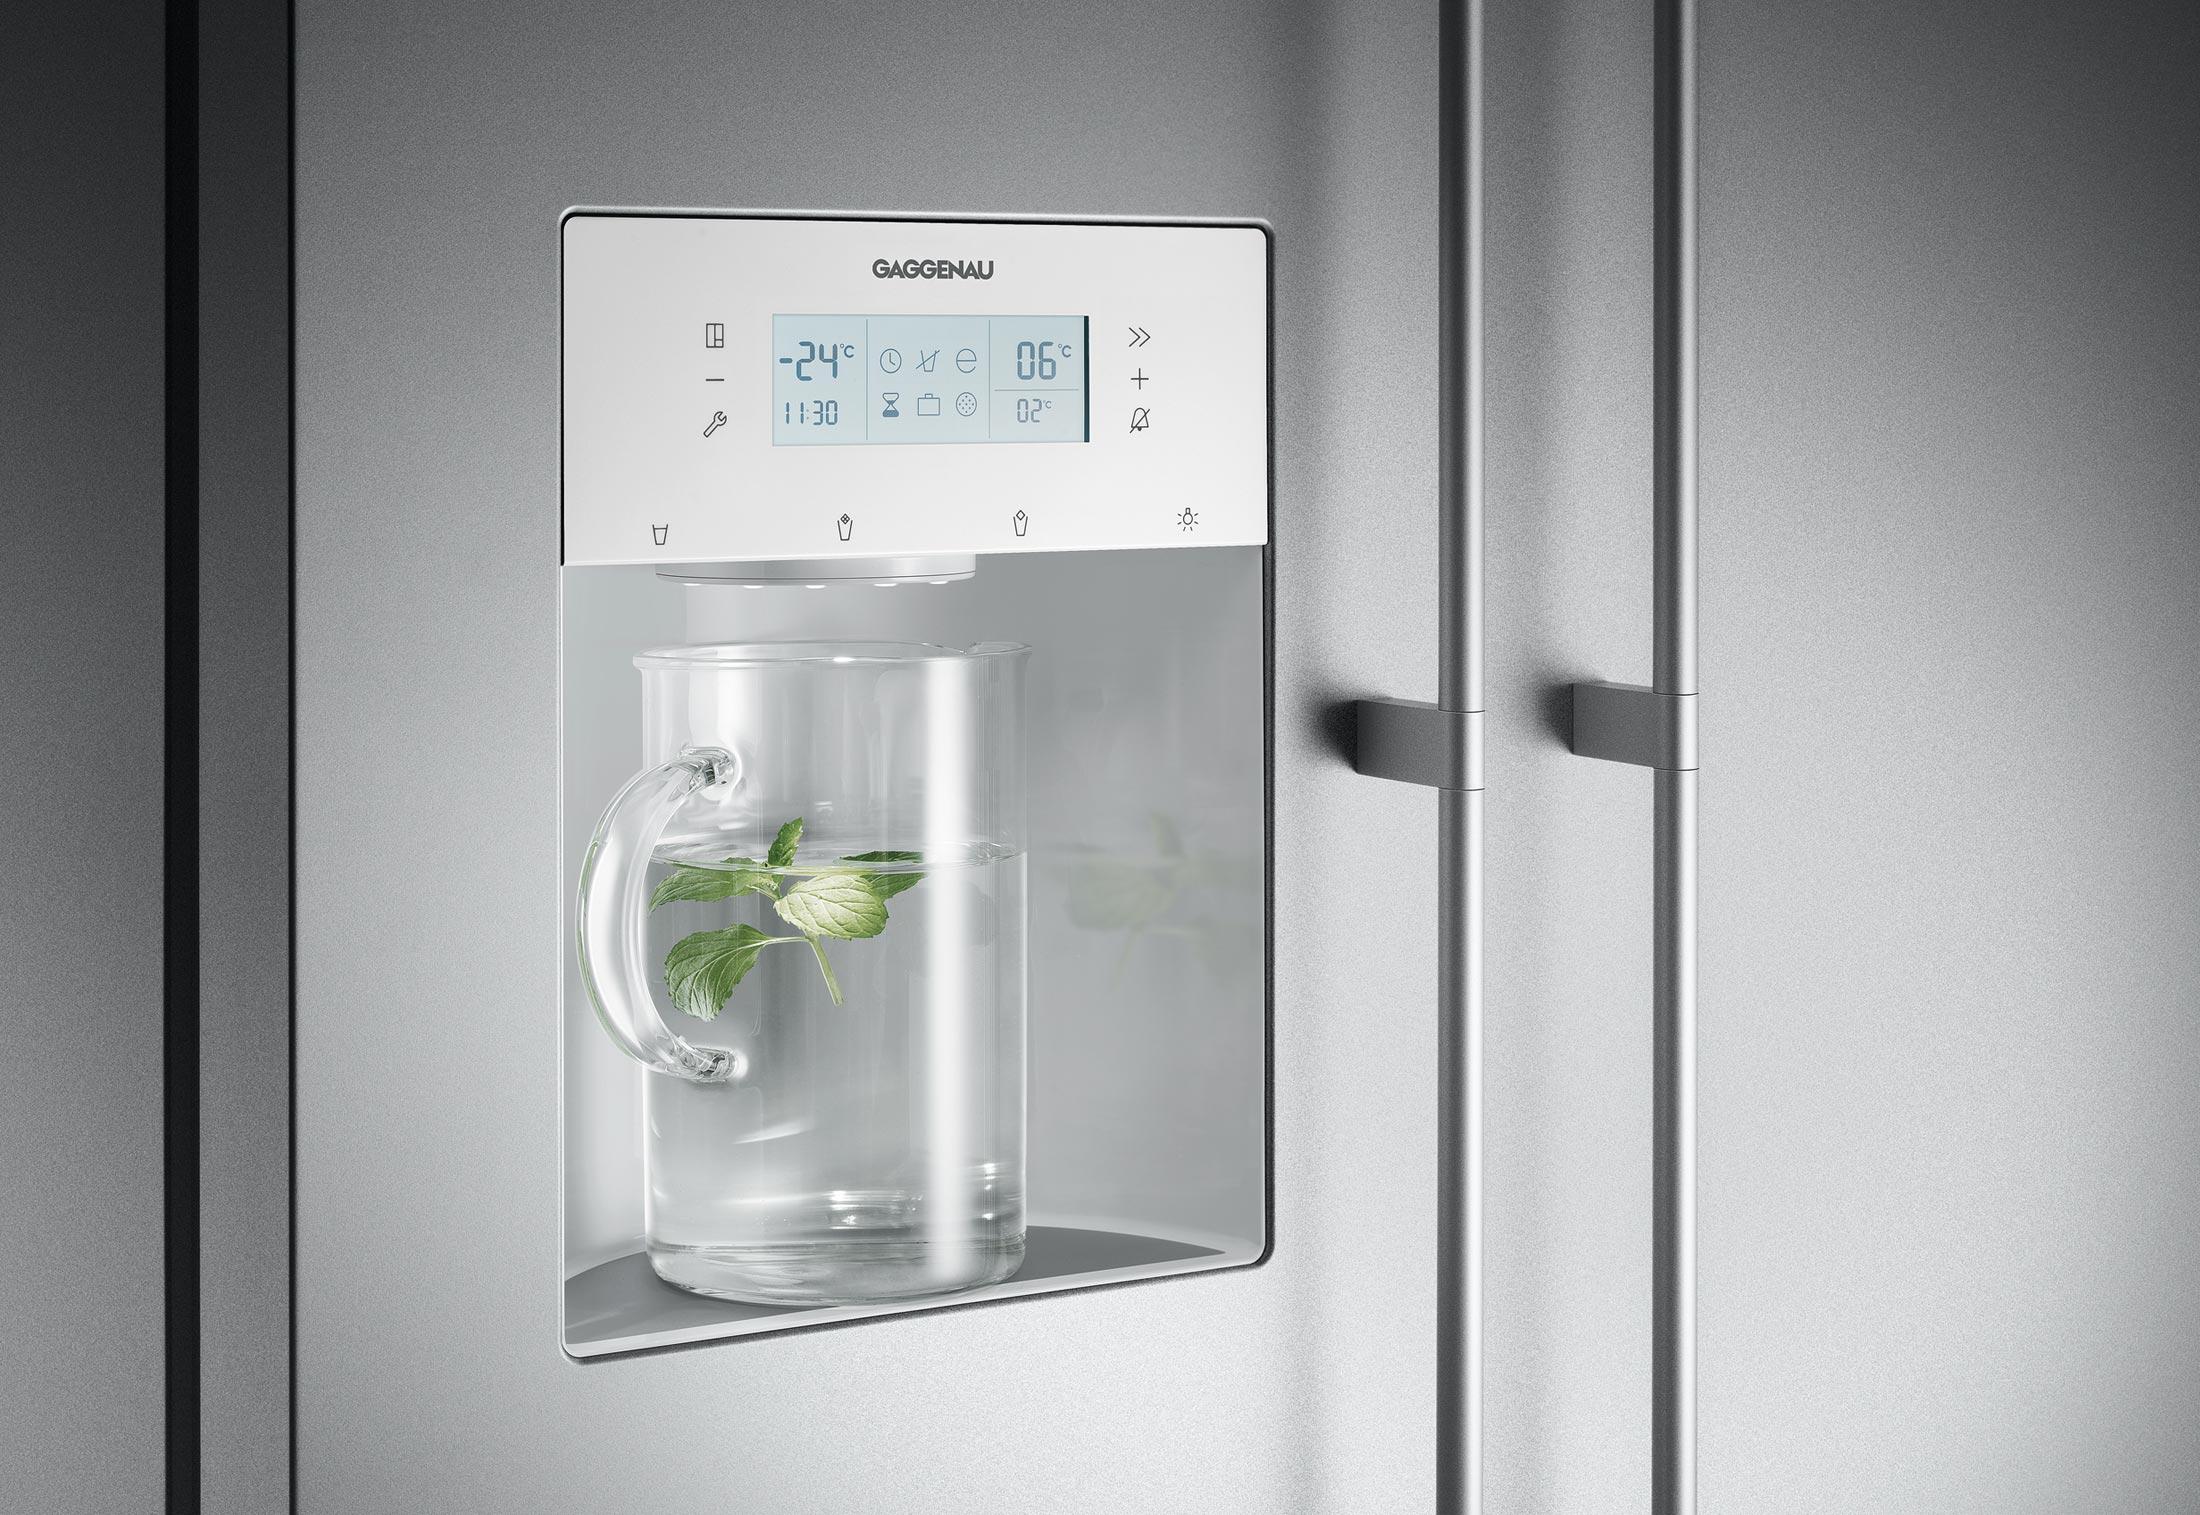 Gaggenau, exclusive partner for De Padova - Home Appliances World